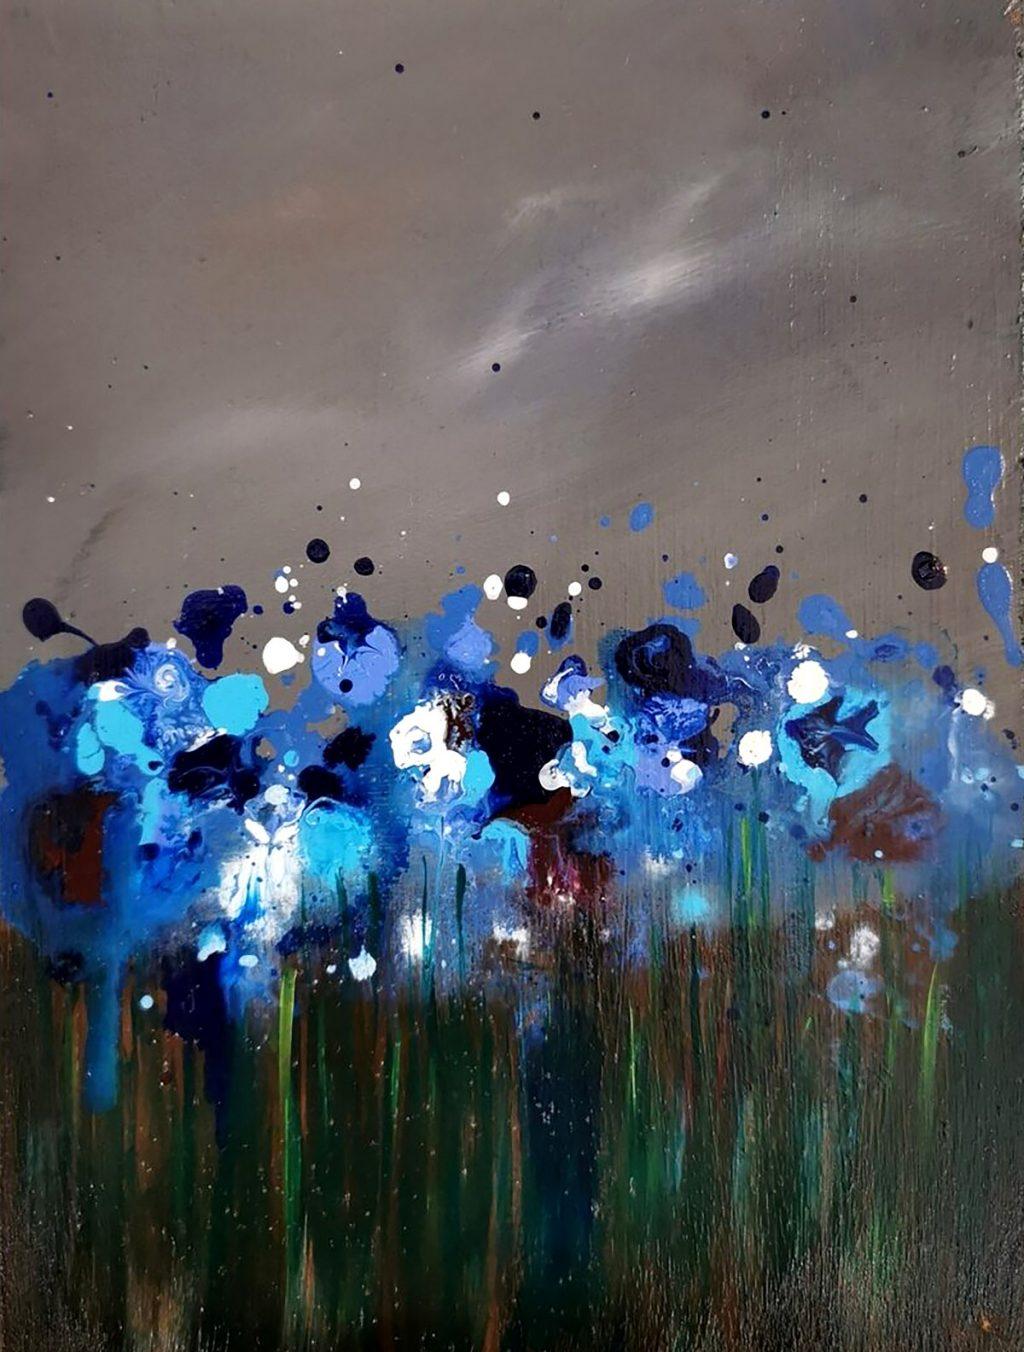 Gill Knight, 'Blueness', acrylic